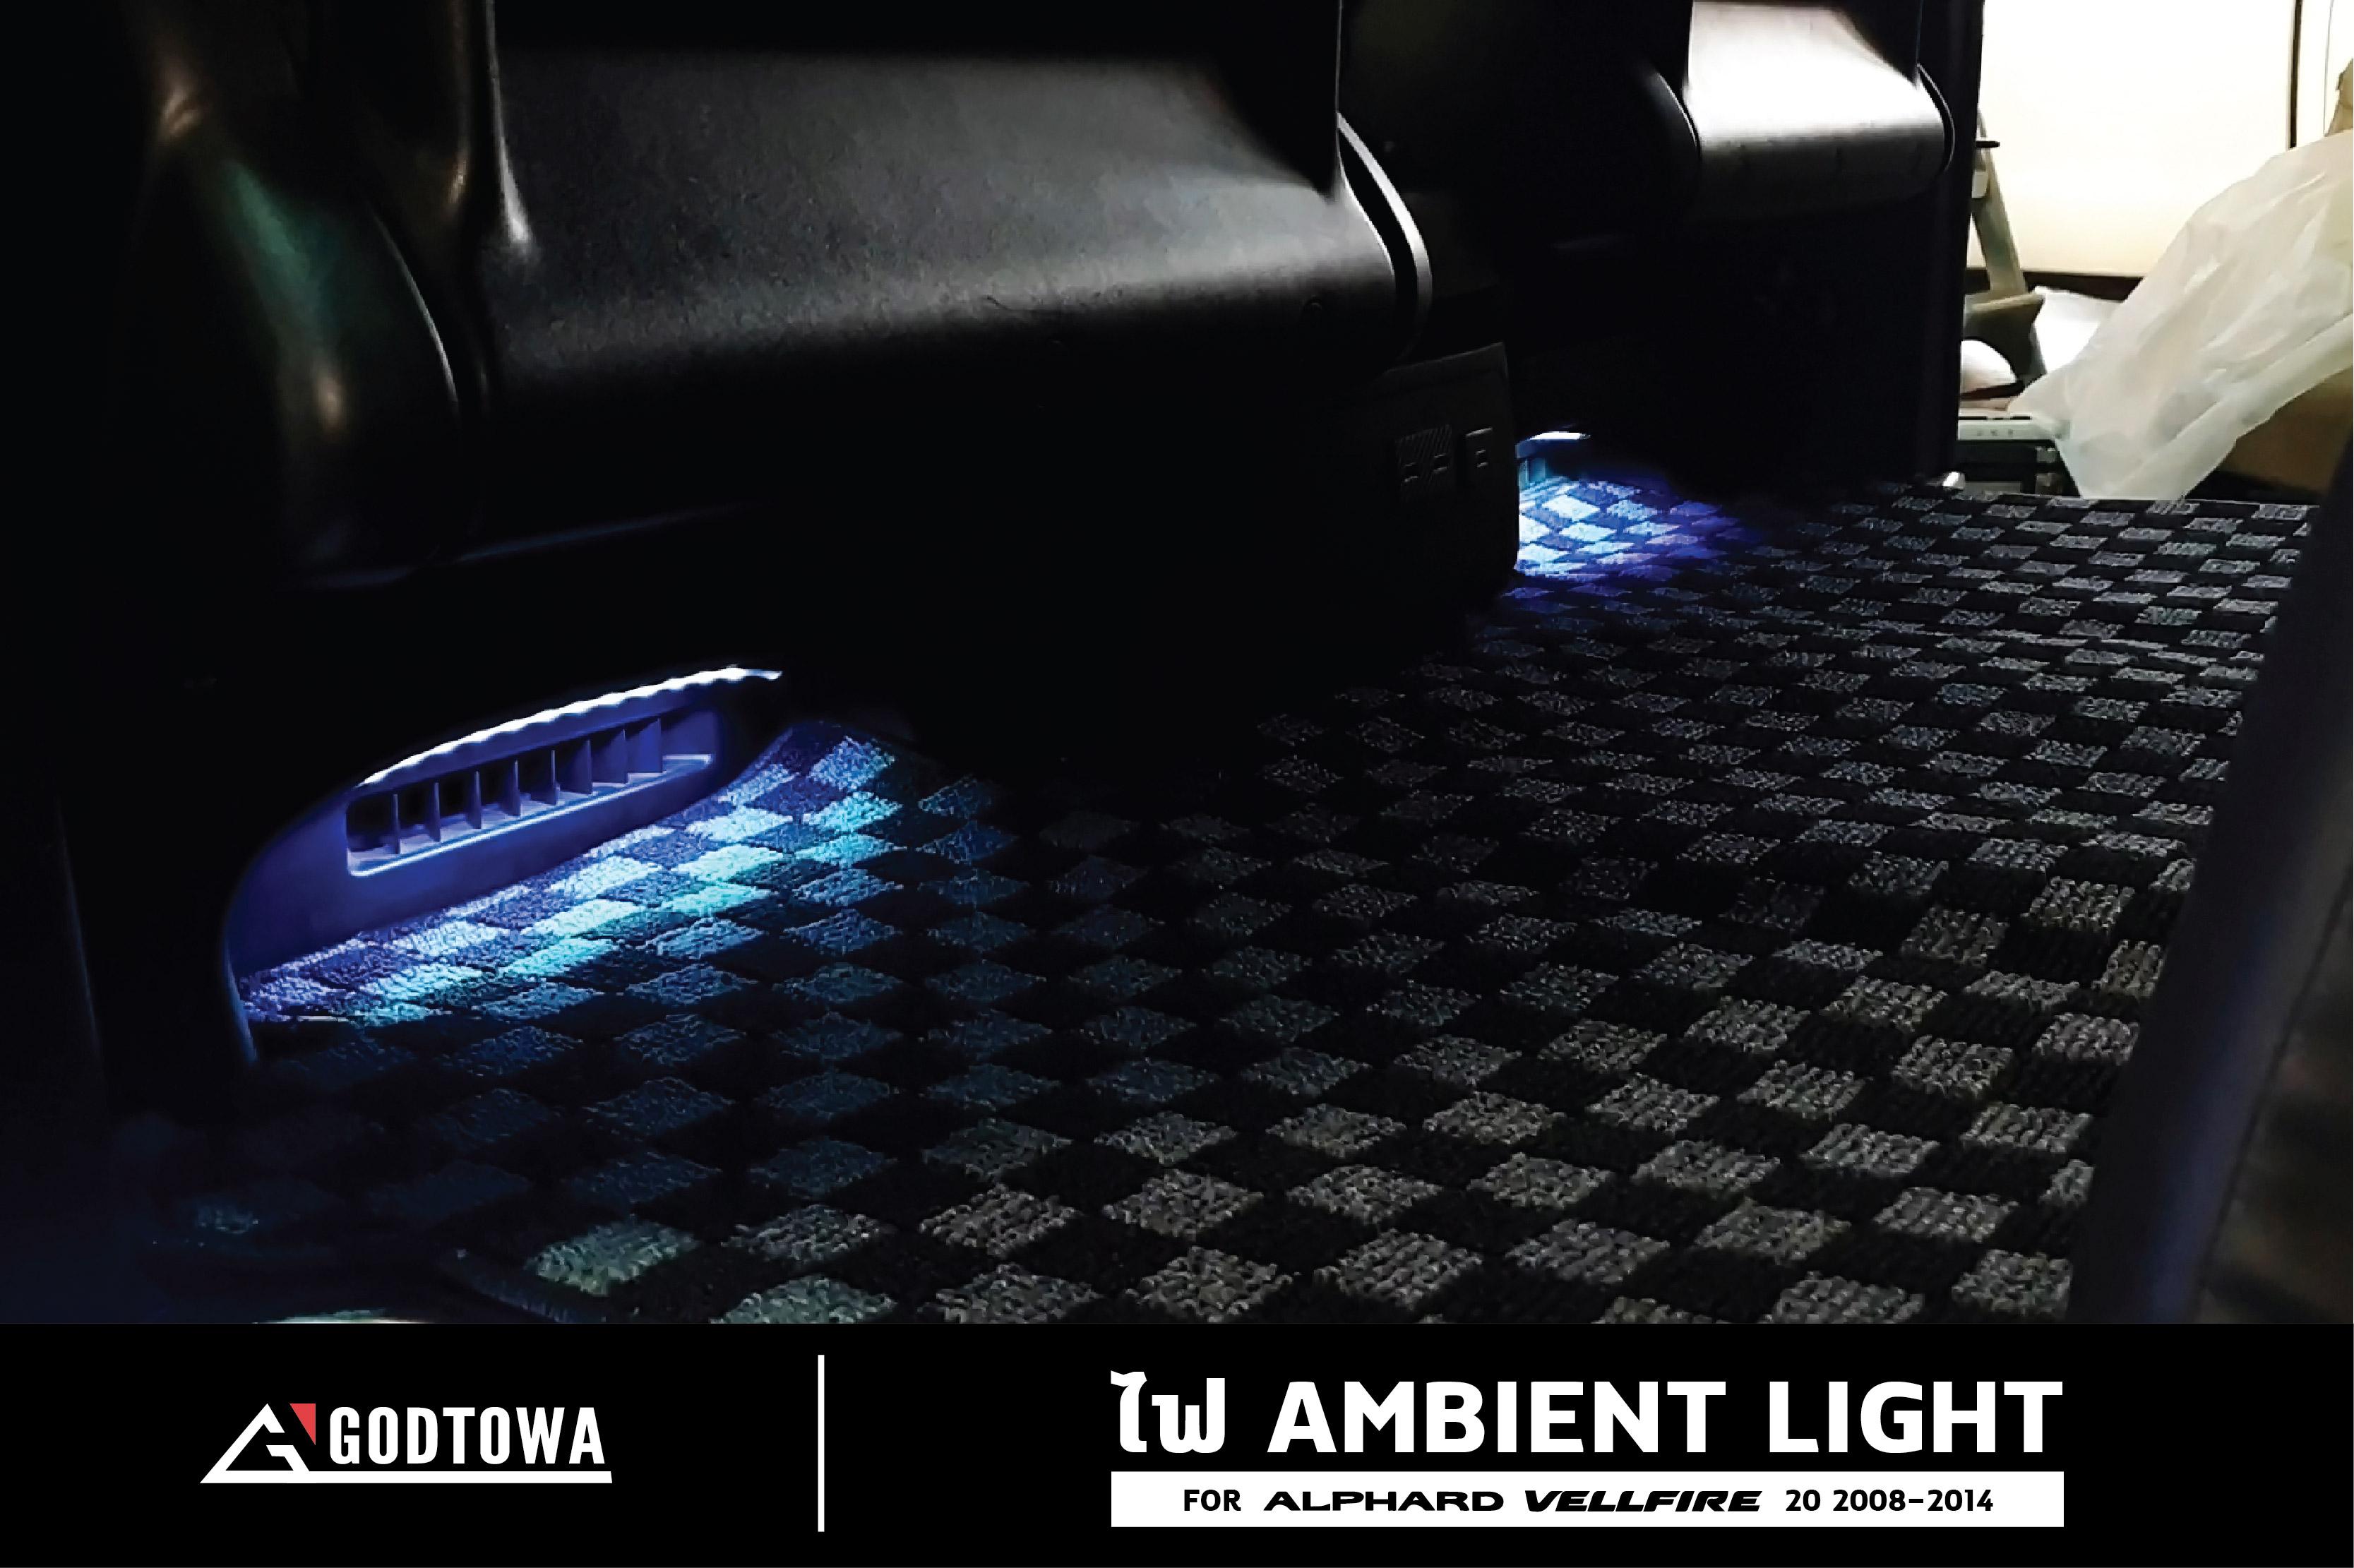 AMBIENT LIGHT ALPHARD/VELLFIRE 20